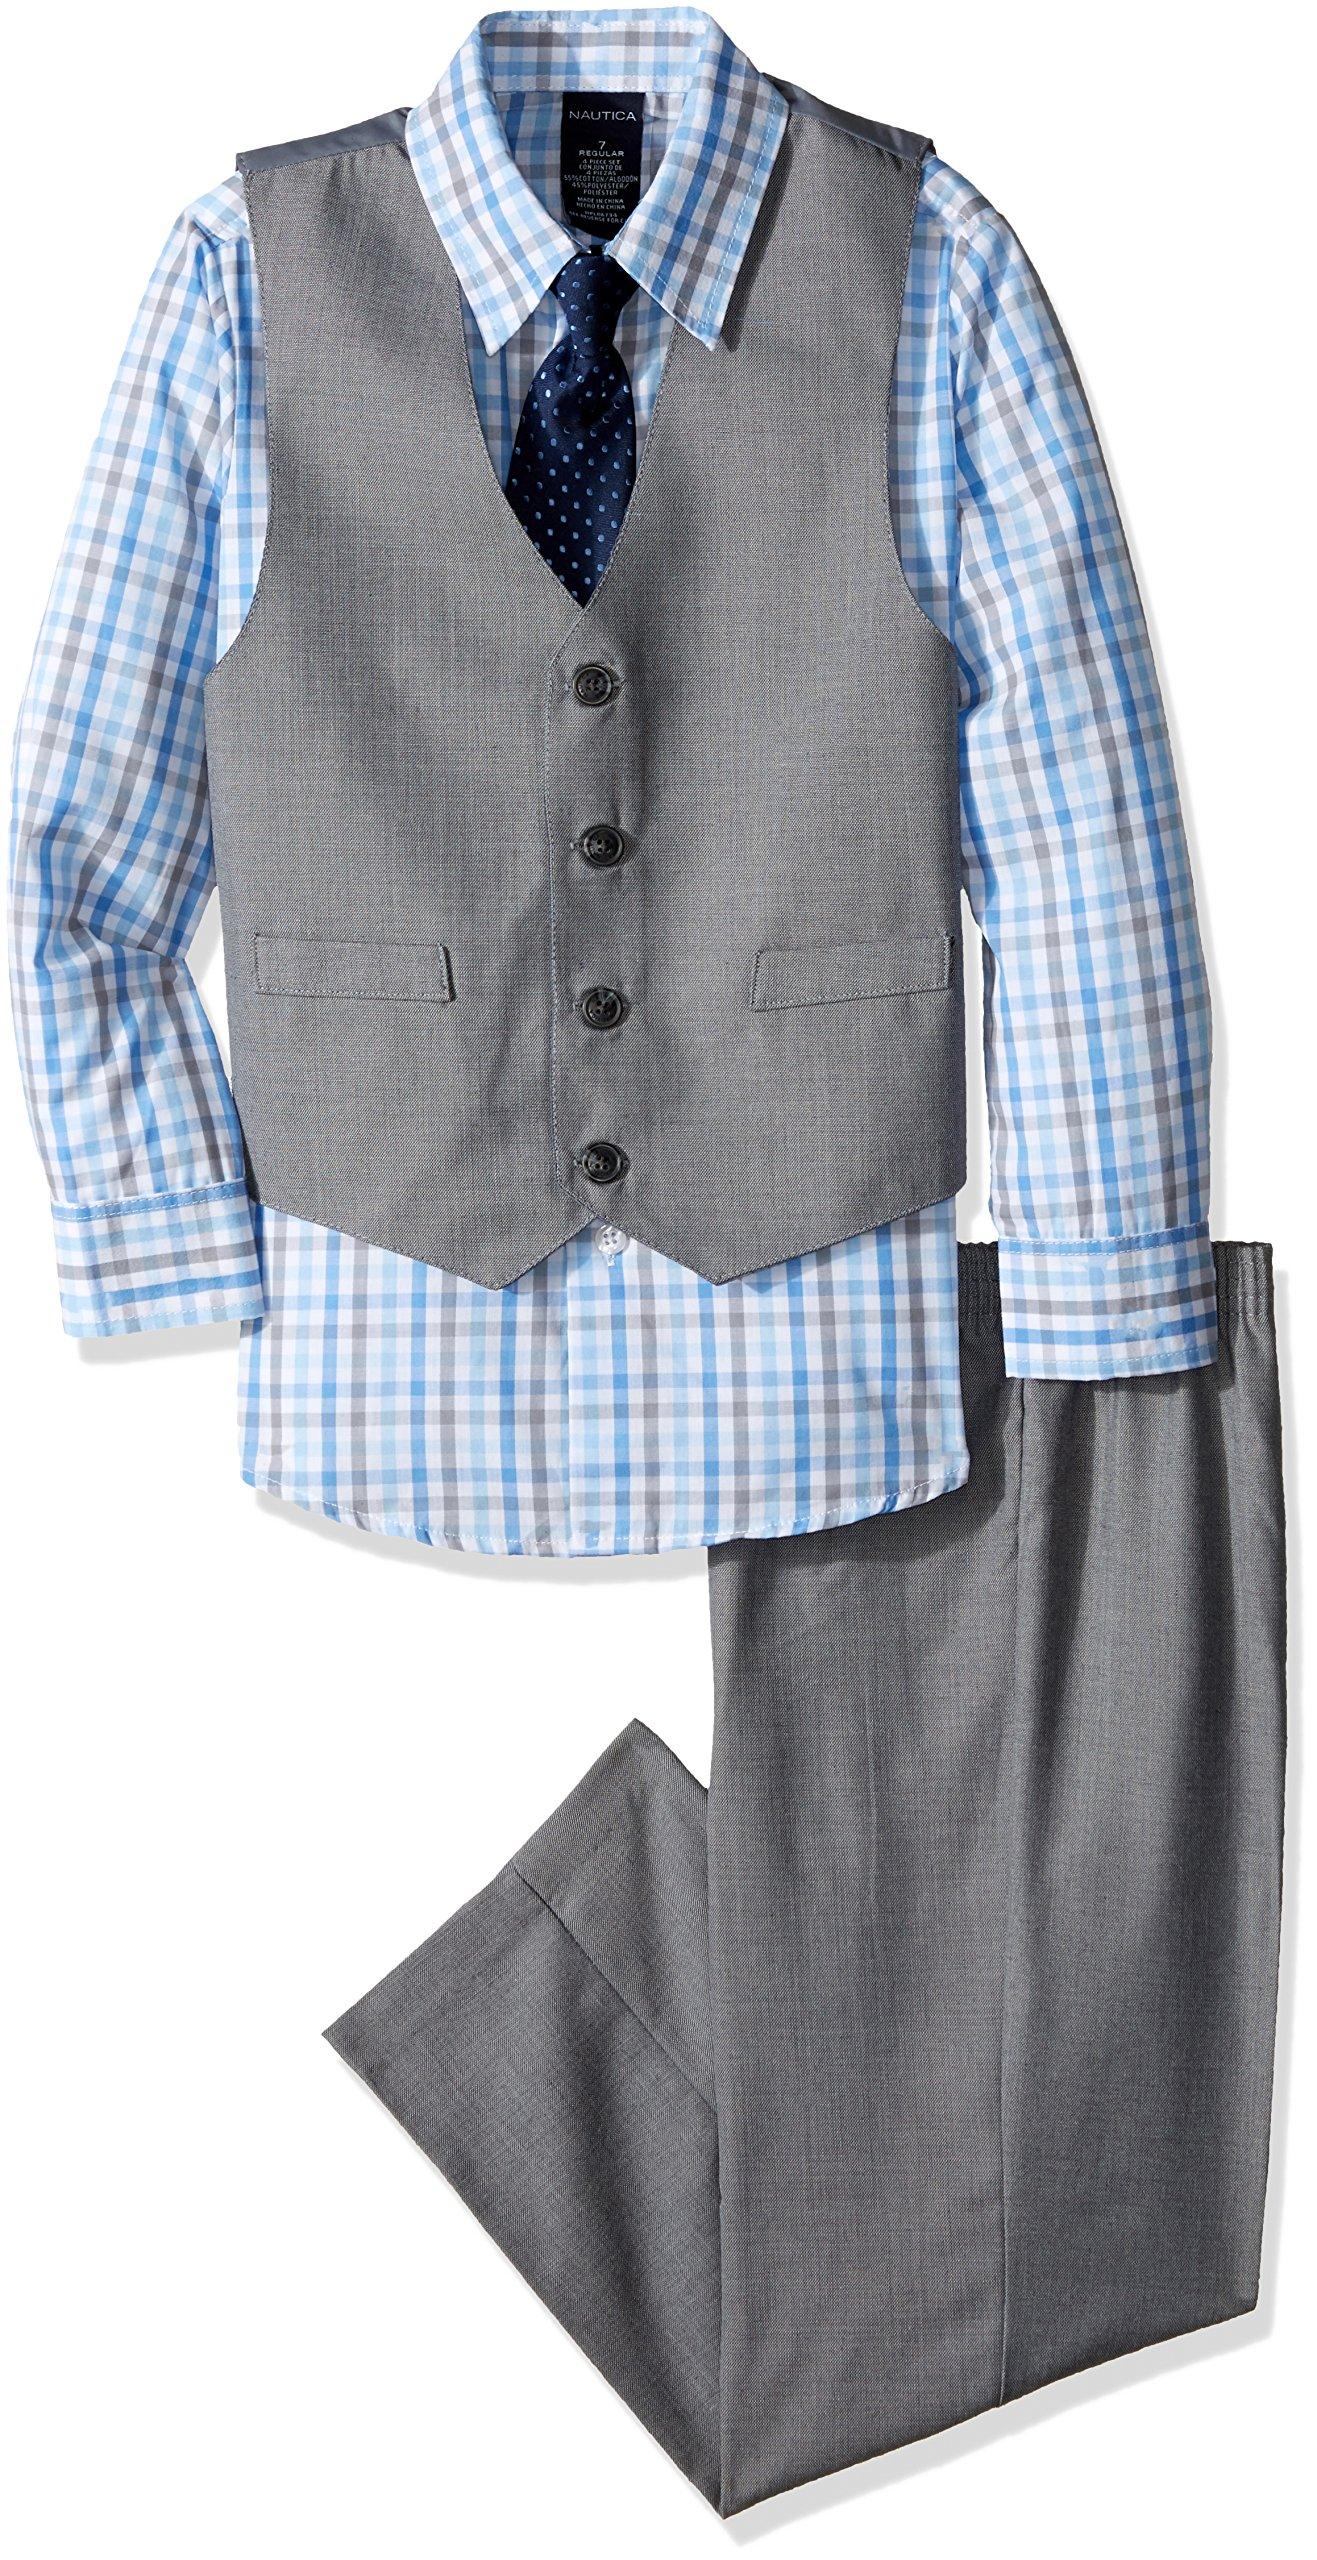 Nautica Dressy Vest Set, Light Grey, 2T/2